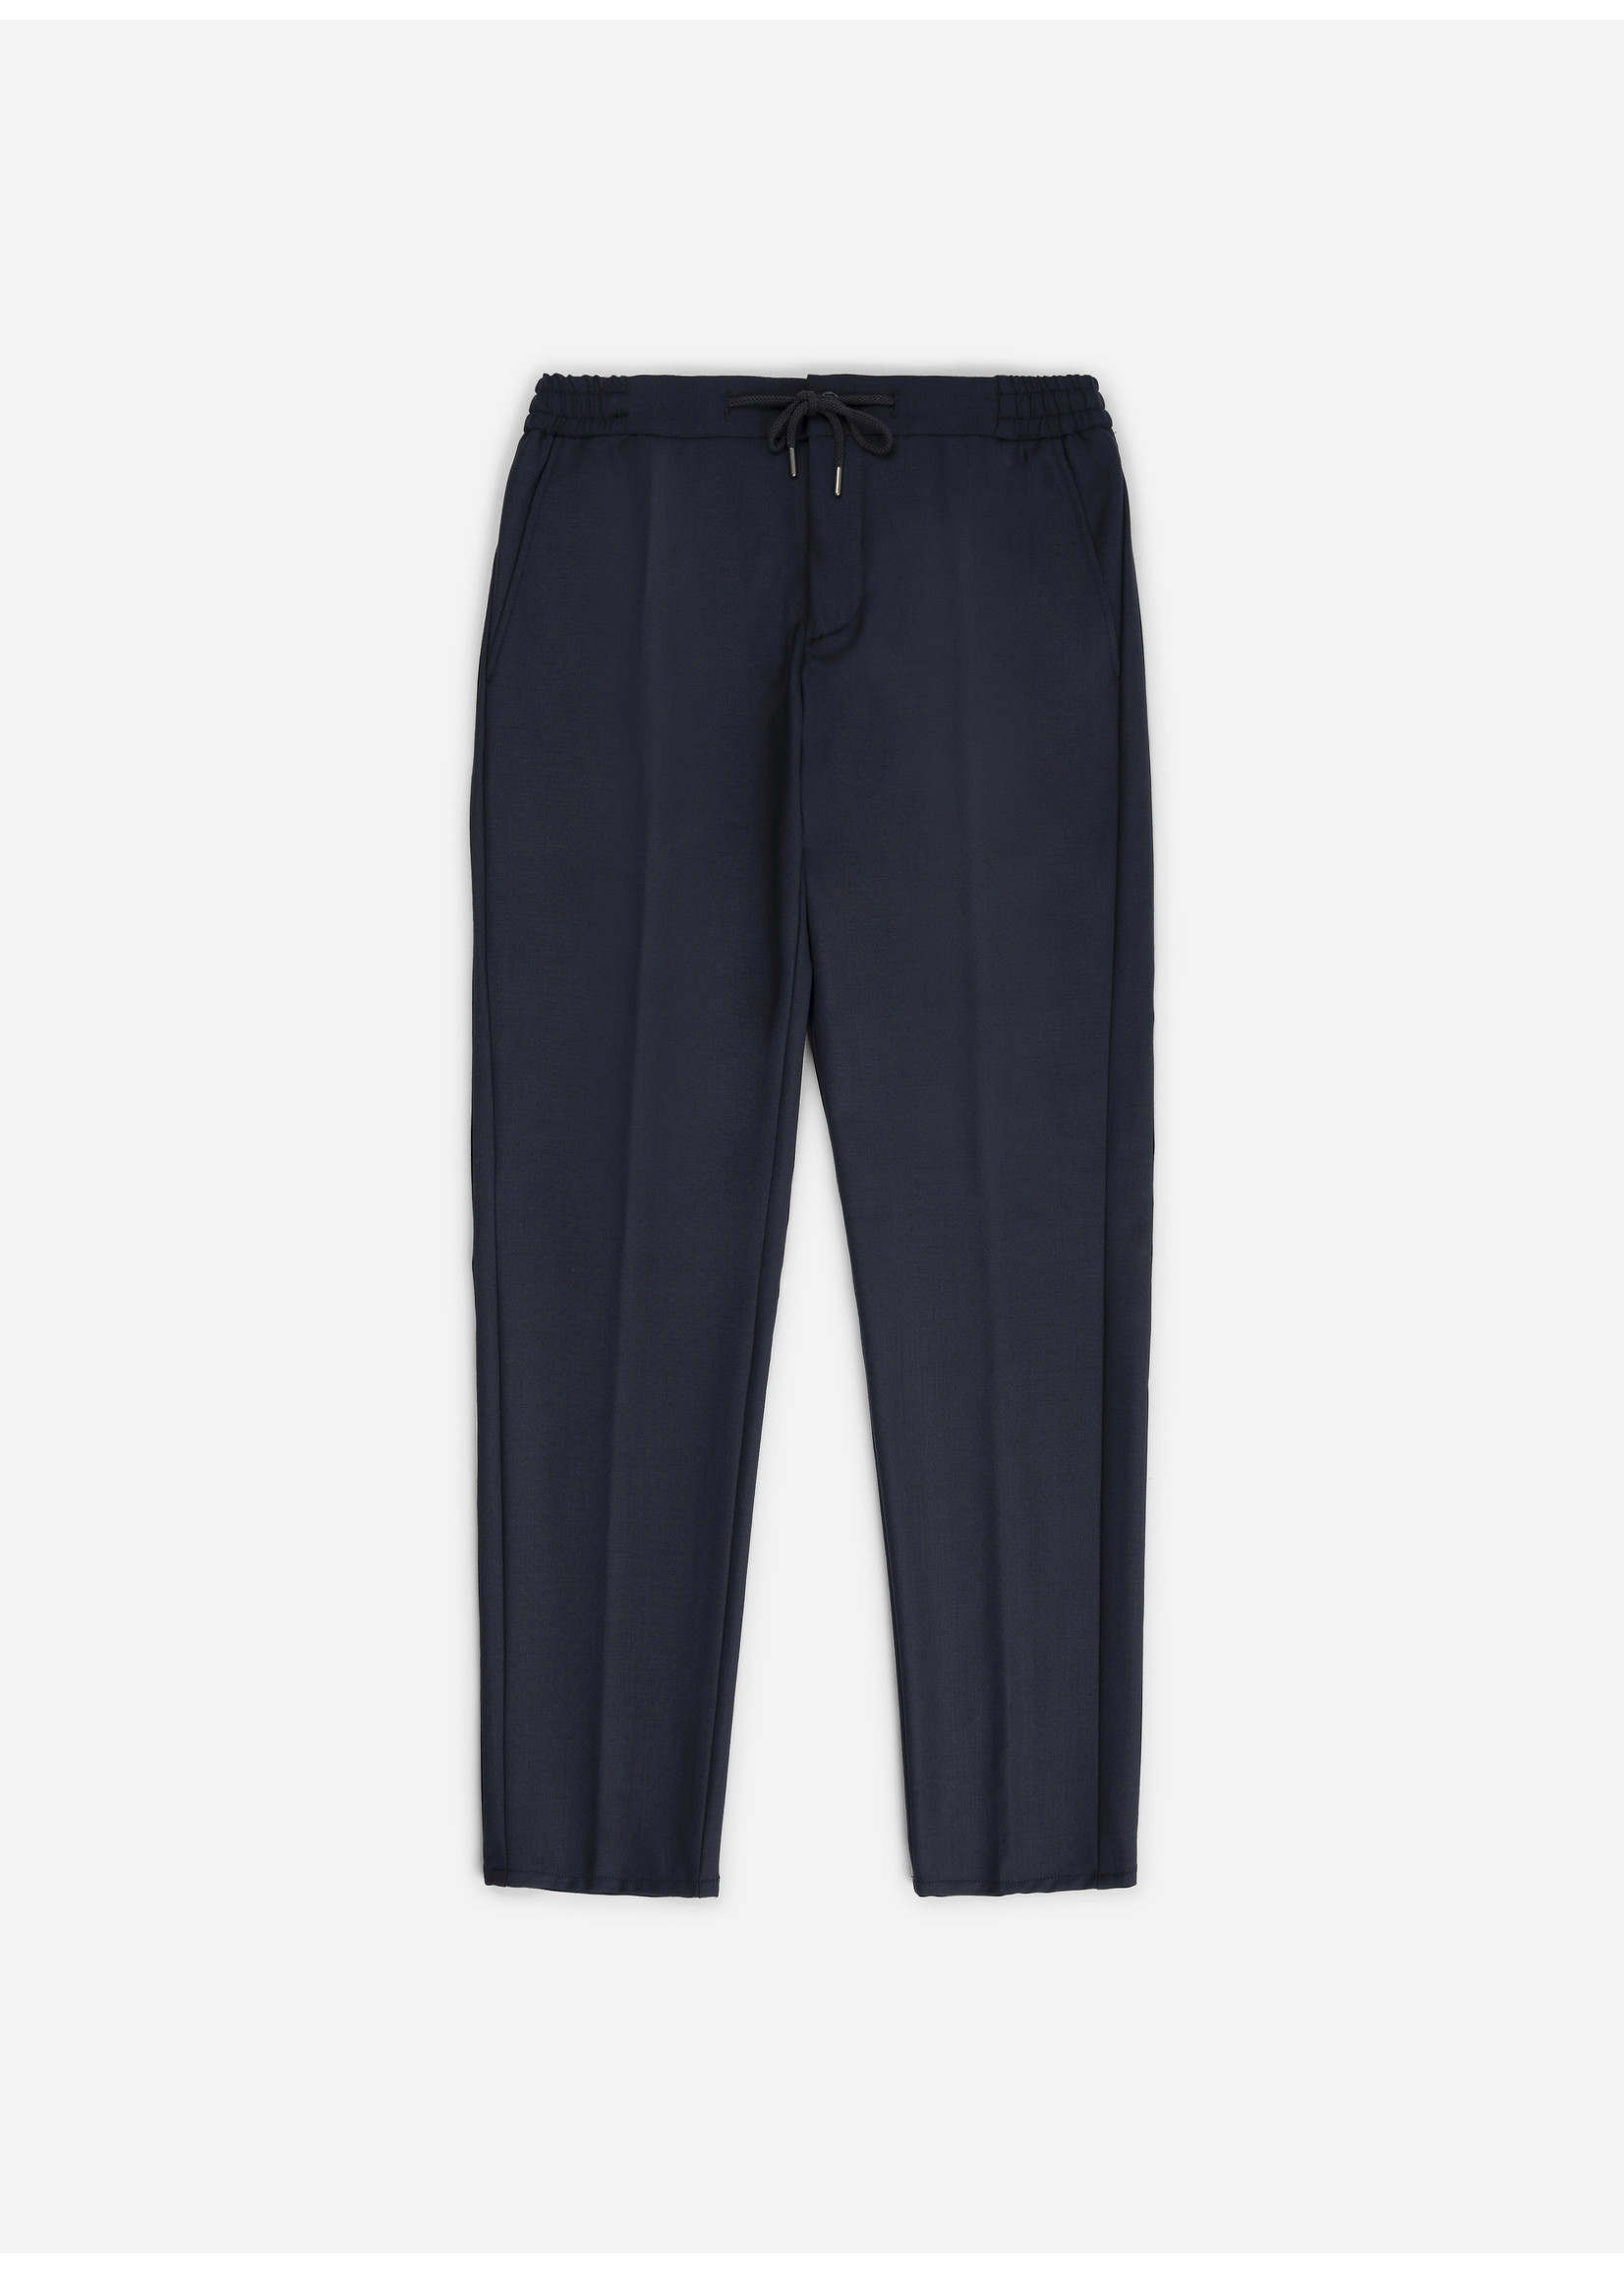 Ridiculous Classic Pantalone Slim Navy